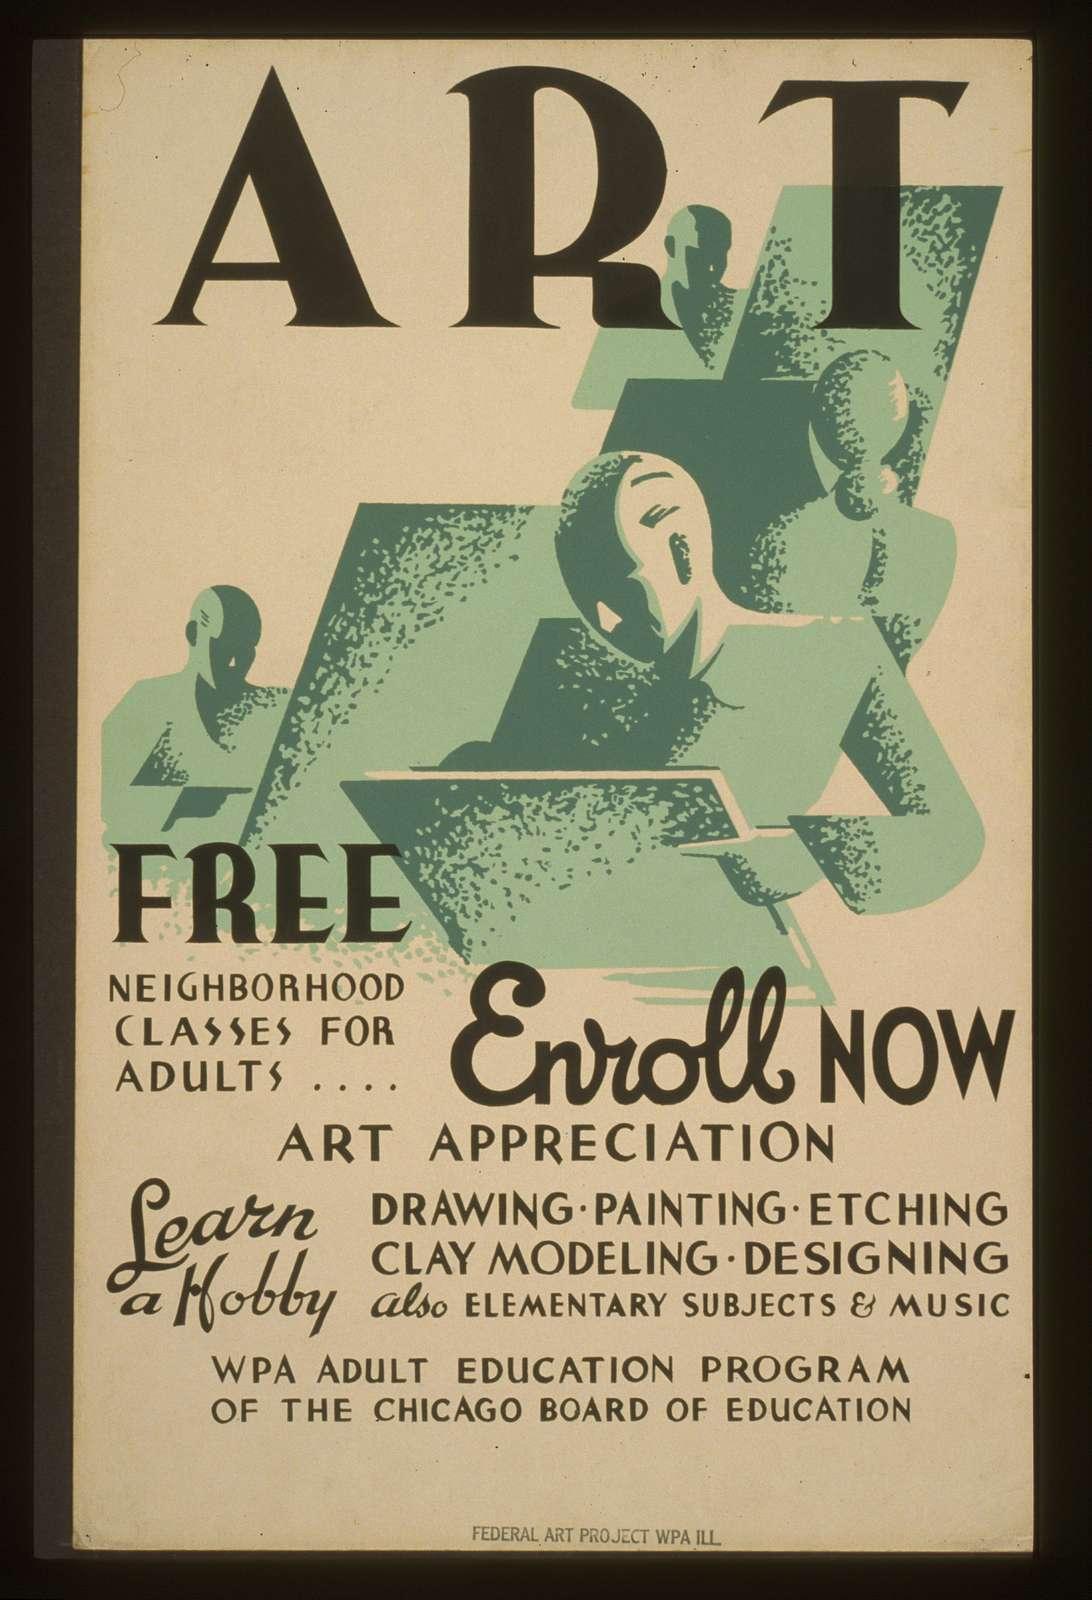 Art - Free neighborhood classes for adults ... enroll now